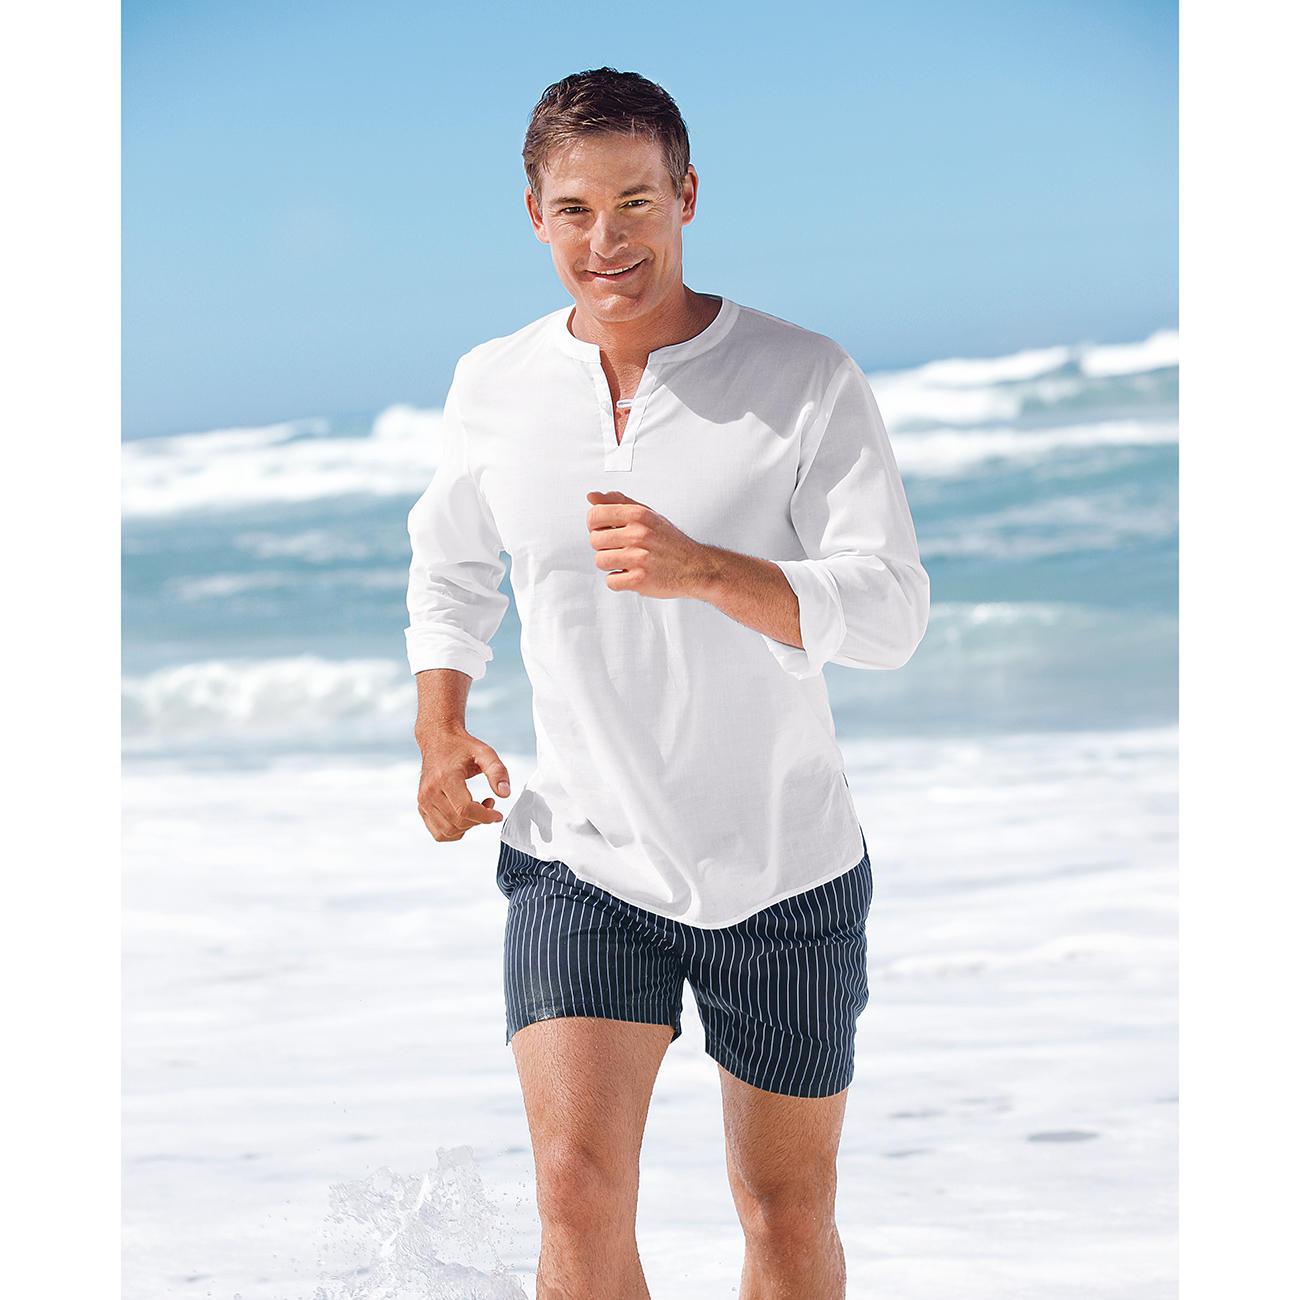 beachshirt wahre mode klassiker entdecken. Black Bedroom Furniture Sets. Home Design Ideas